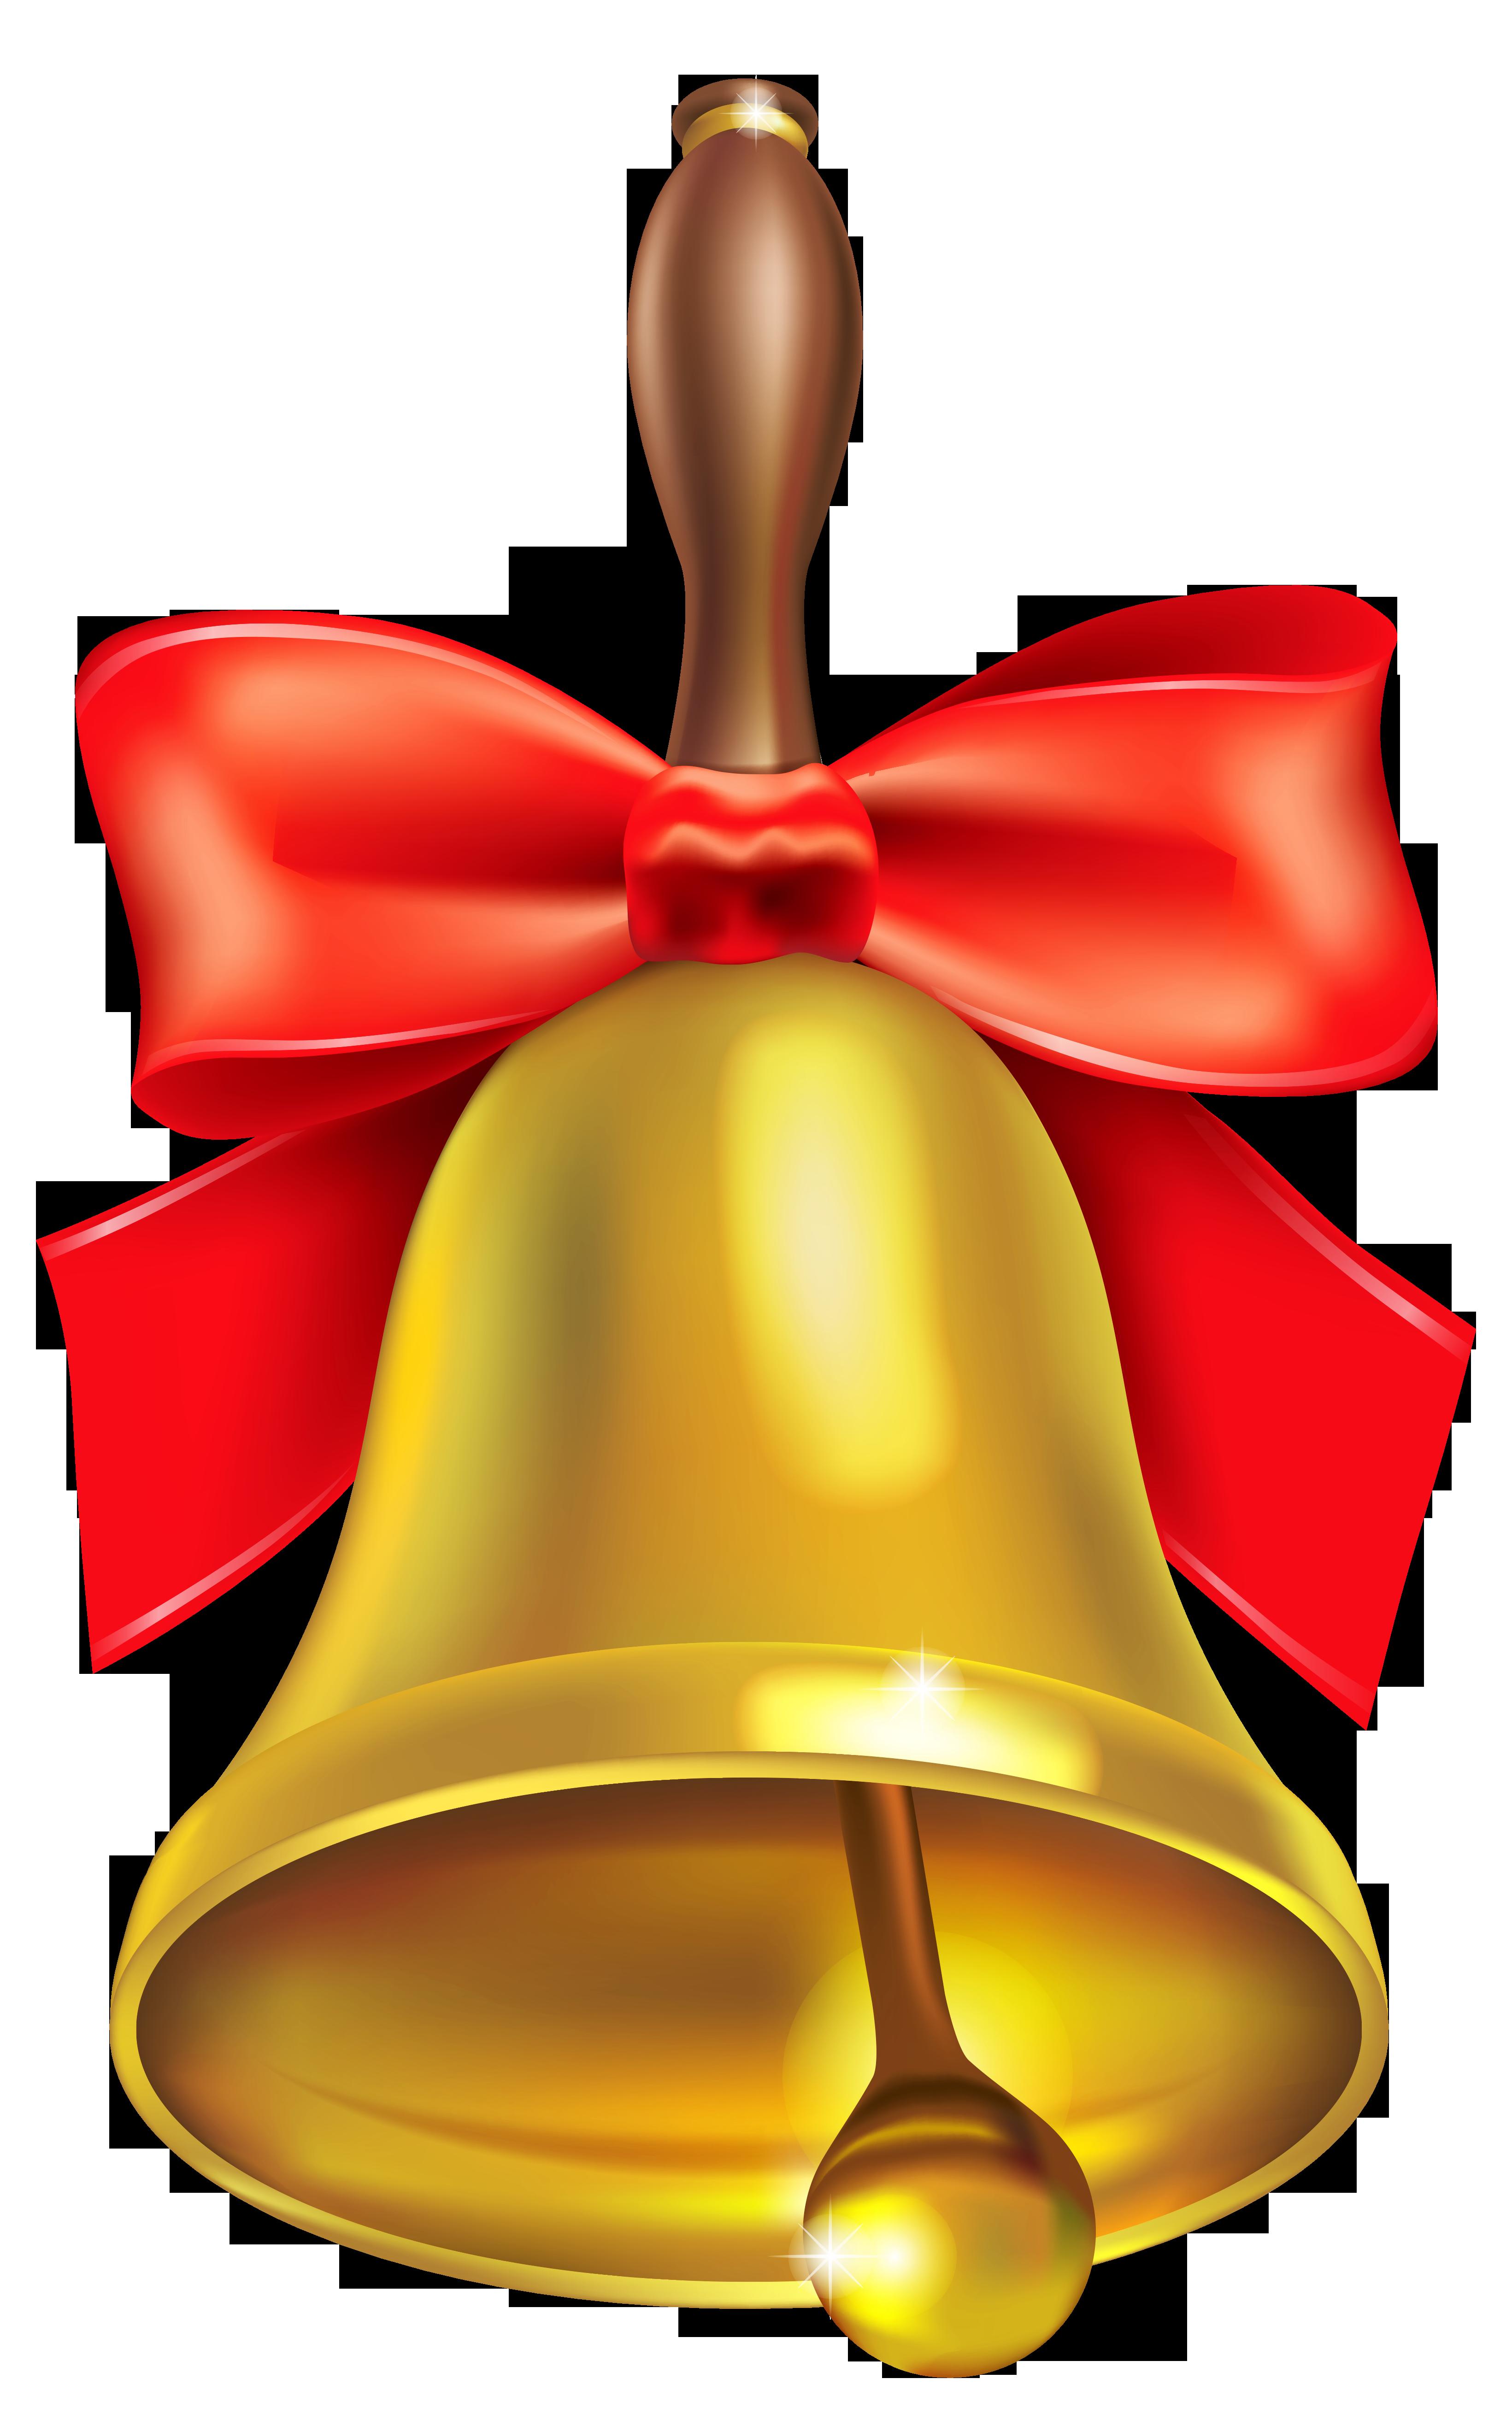 Bell Clipart & Bell Clip Art Images.